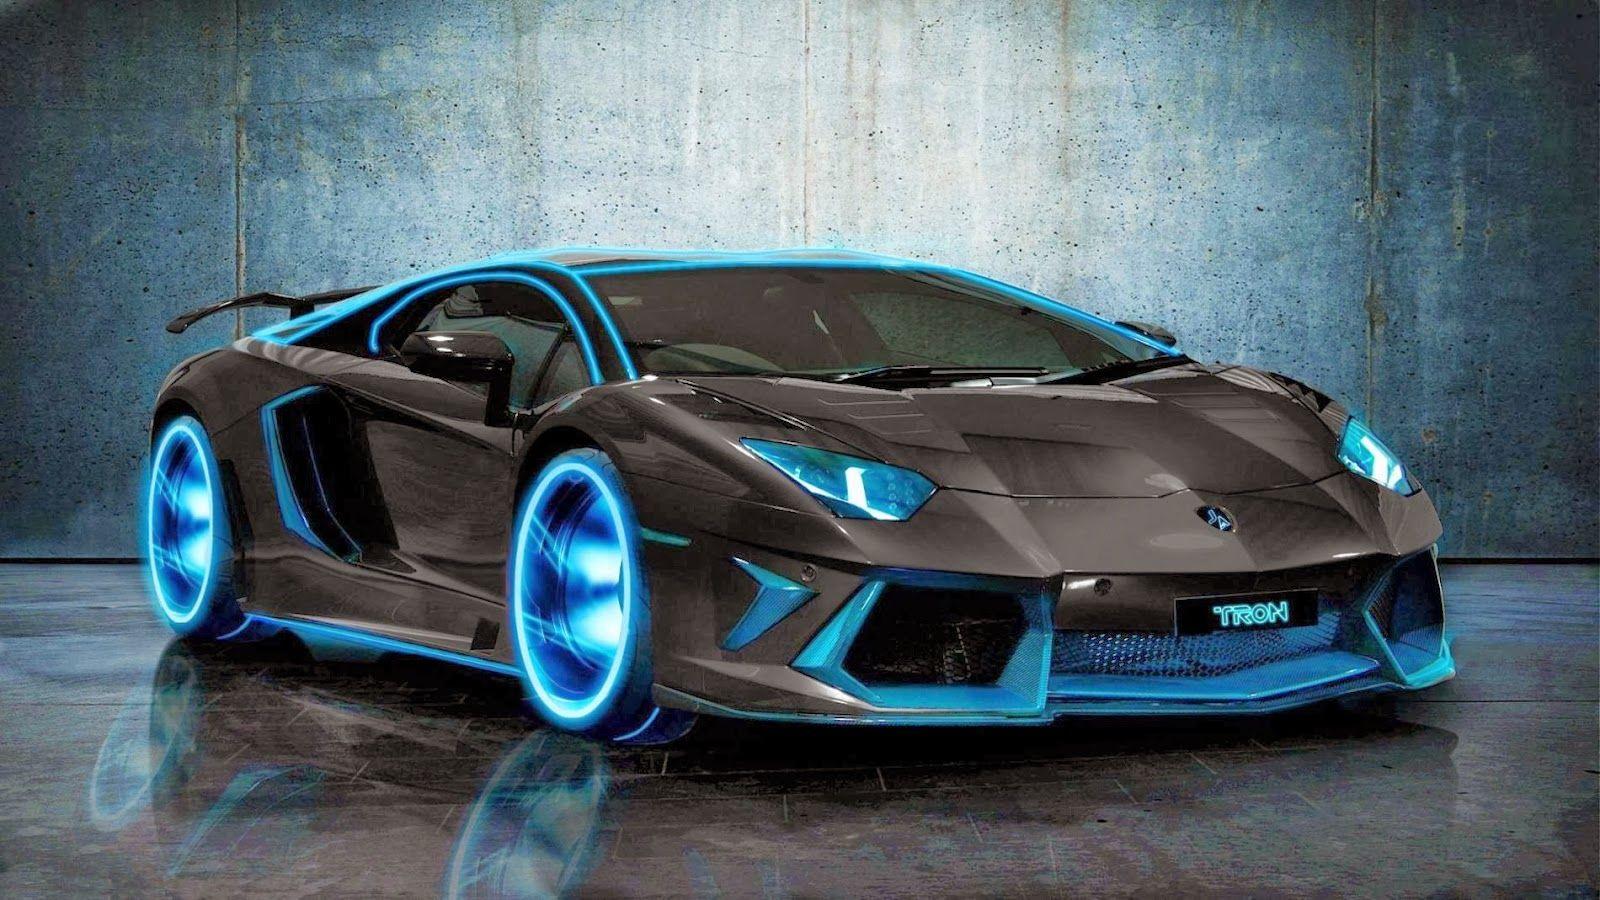 Top Sport Car Lamborghini Wallpaper Hd Www Youthsportfoto Com  Top Sport Car Lamborghini Wallpaper Hd Insurance Exclusions Pinterest